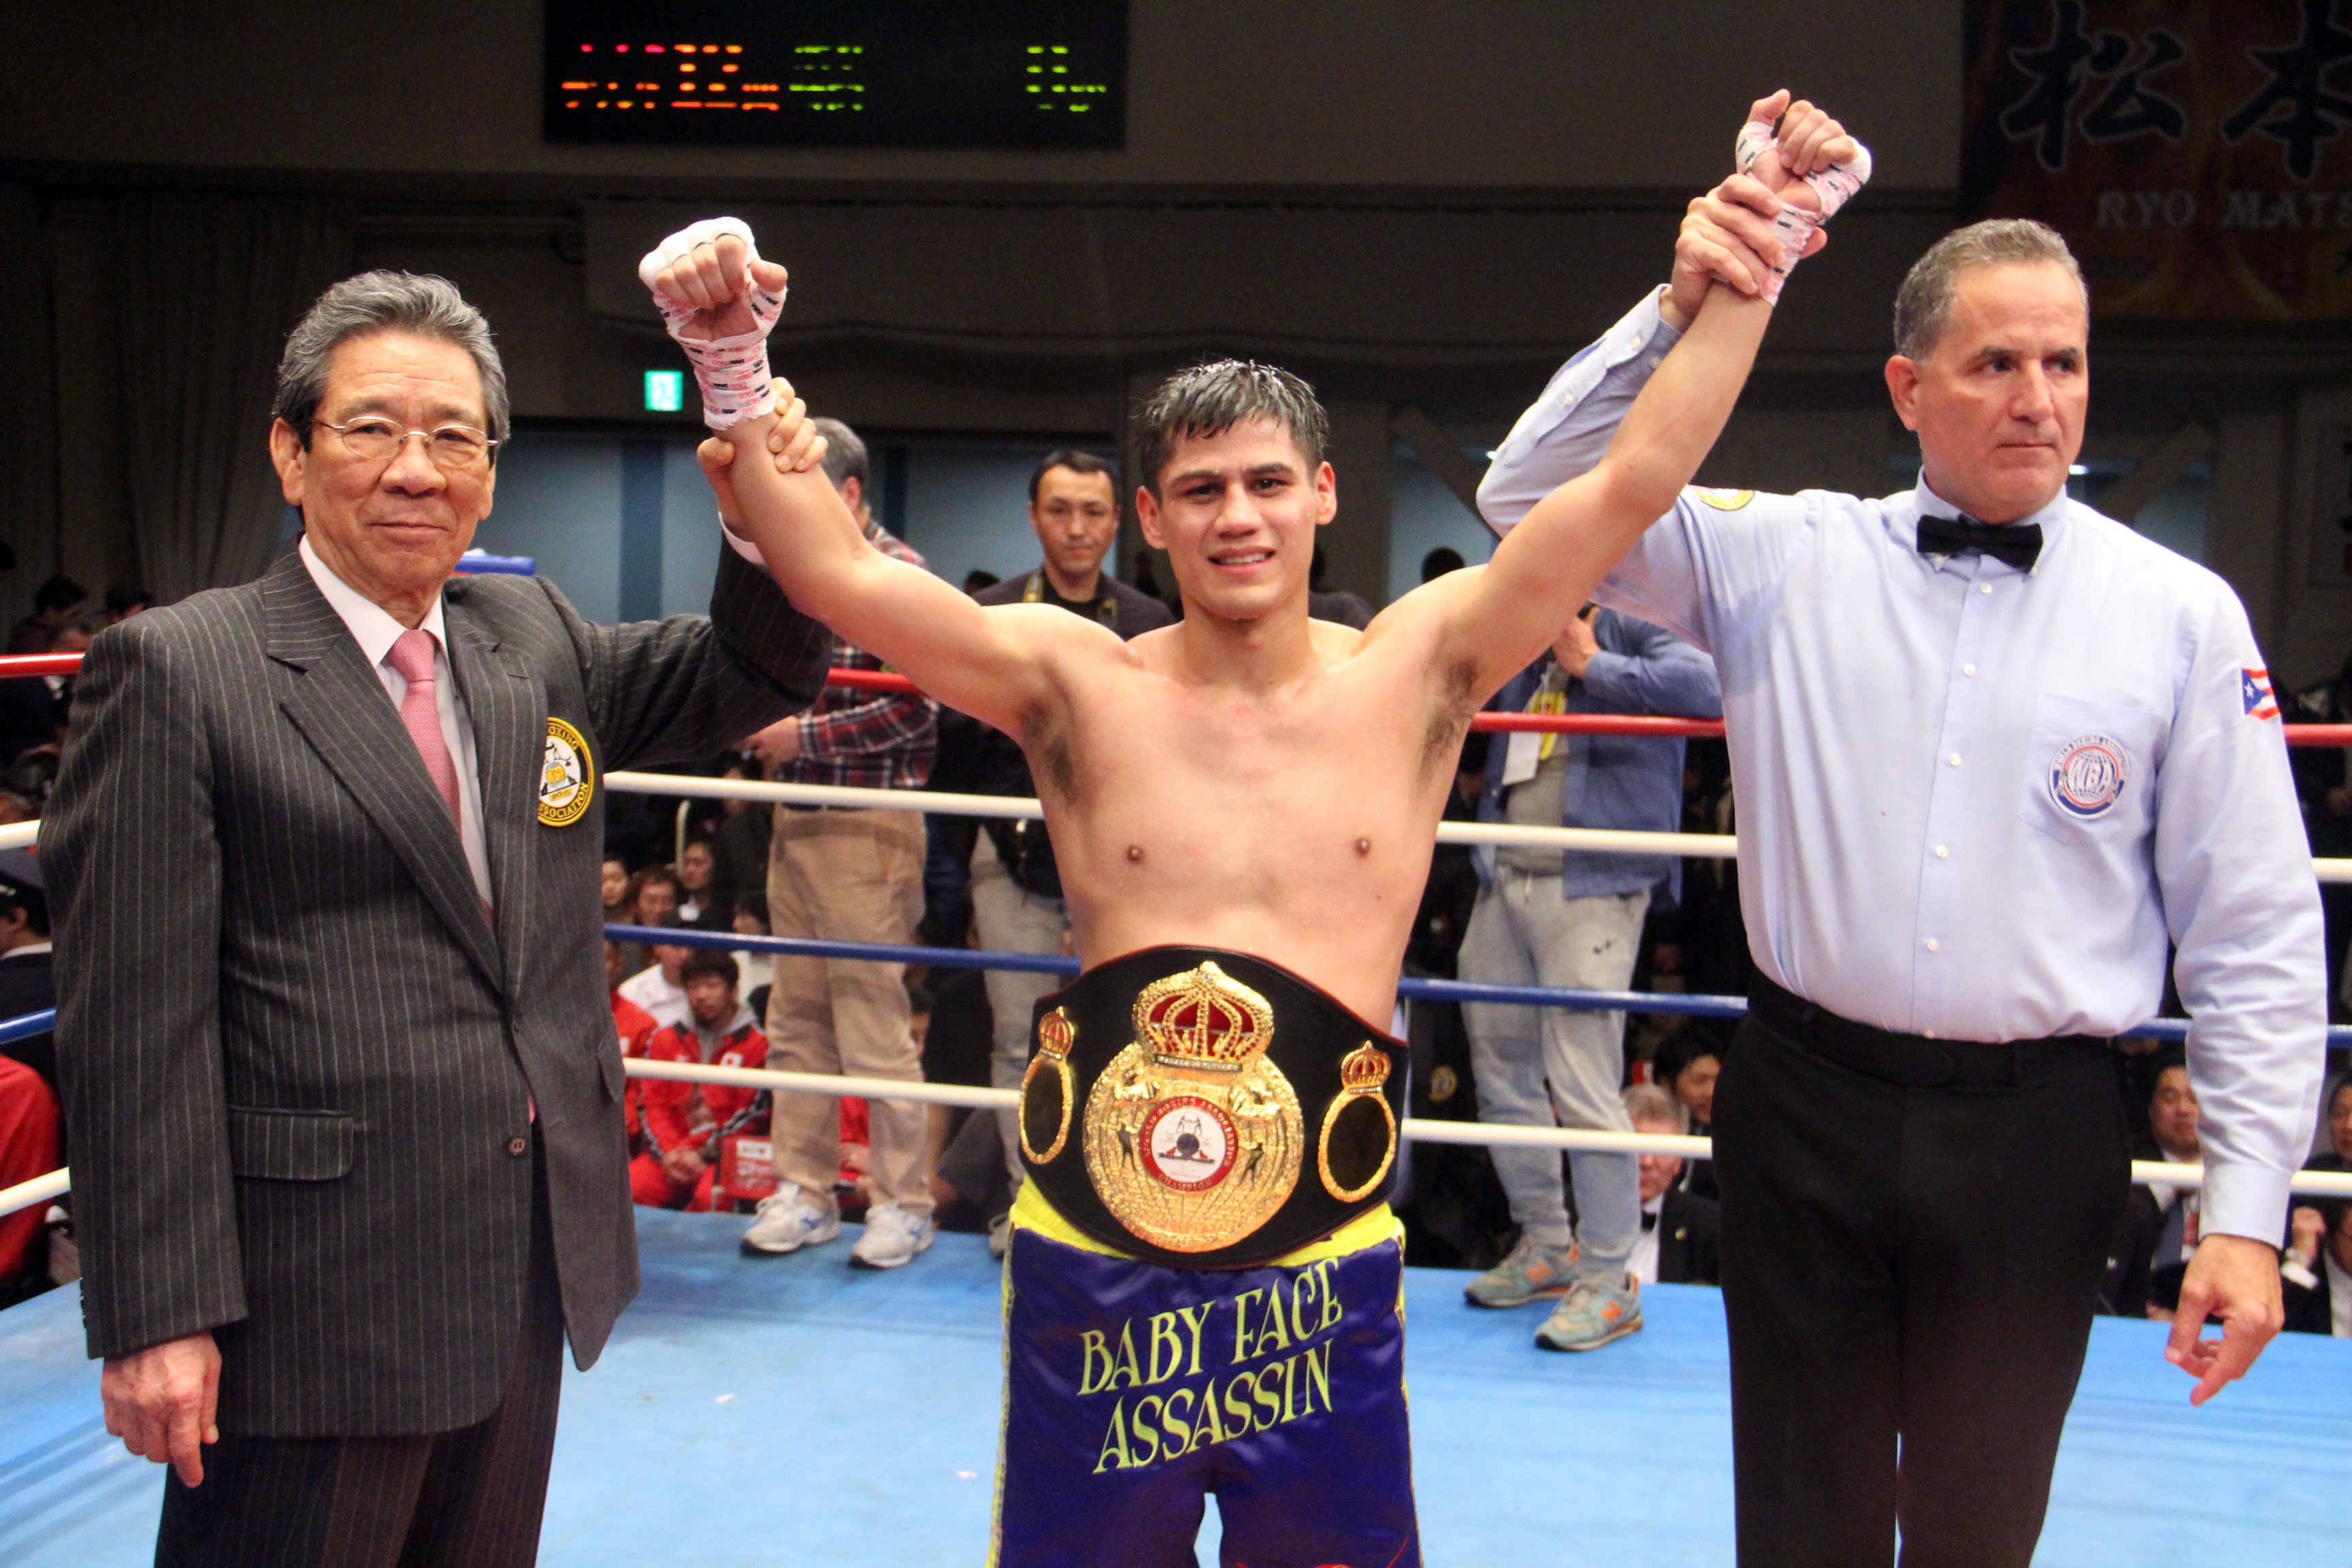 Daniel Román wants to regain his WBA title